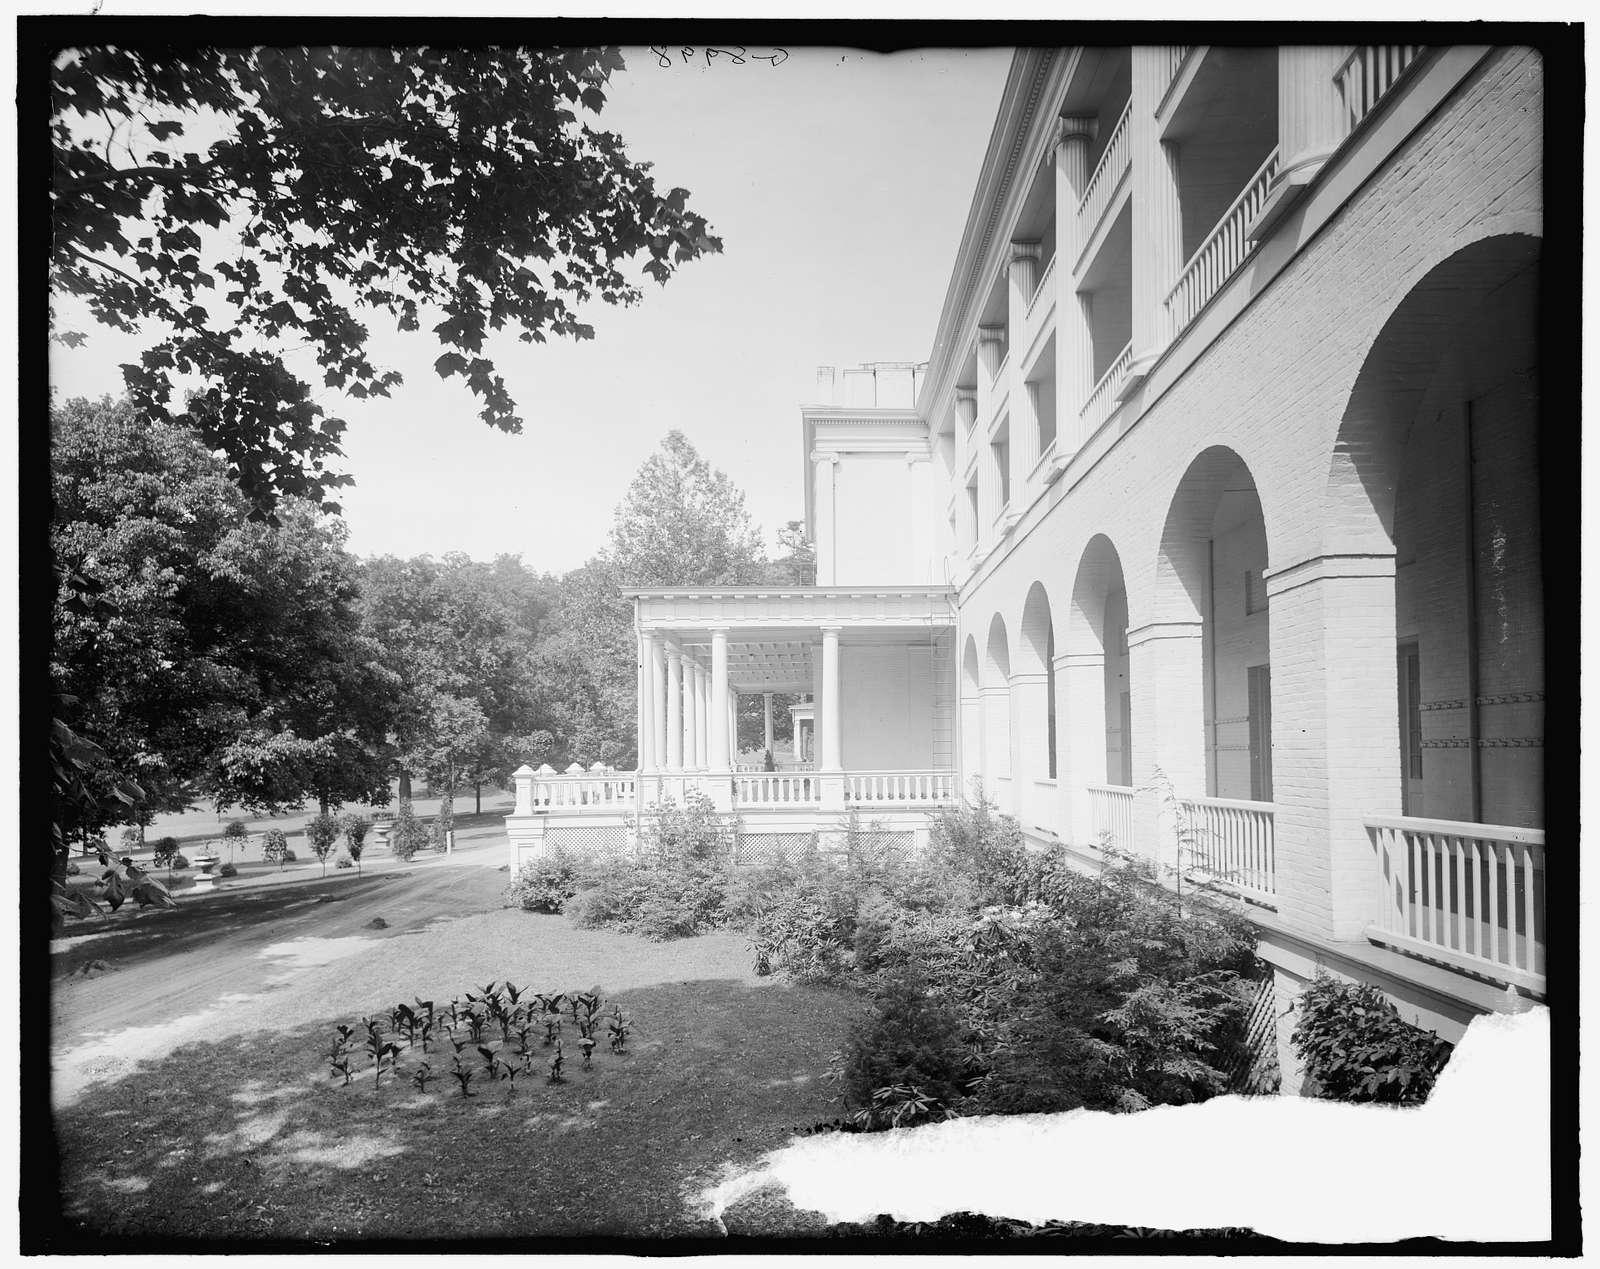 Hotel, White Sulphur Springs, West Va.